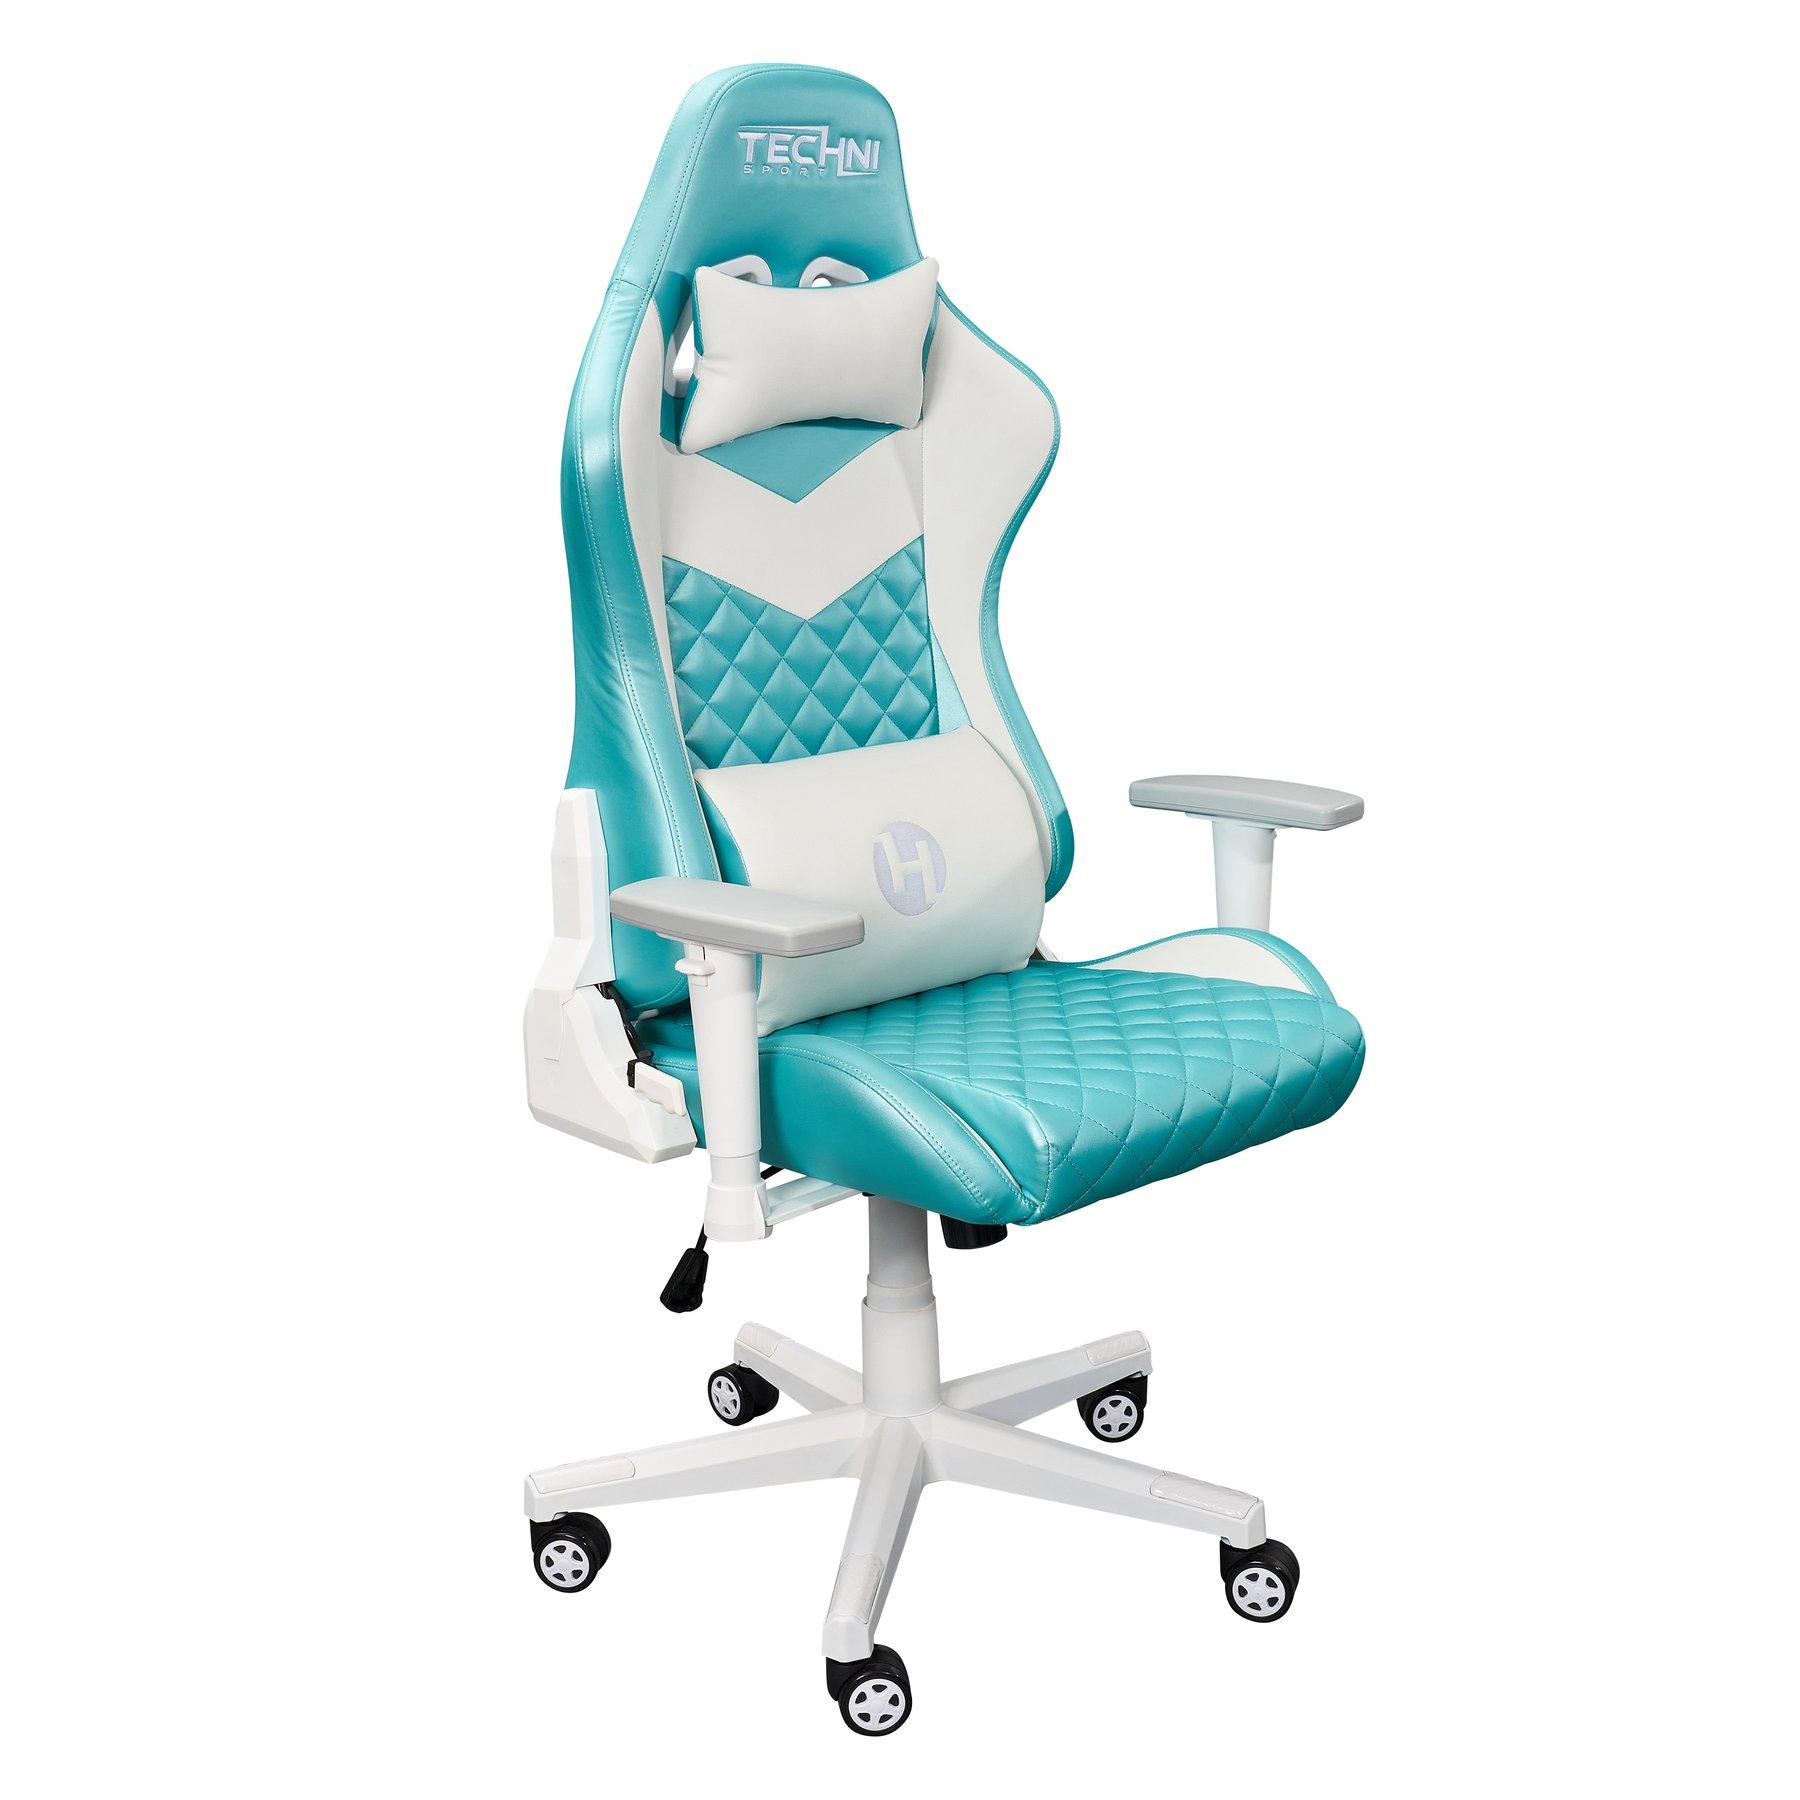 Techni Gaming Chairs Review: TS63 Aqua LUXX Series Gaming Chair